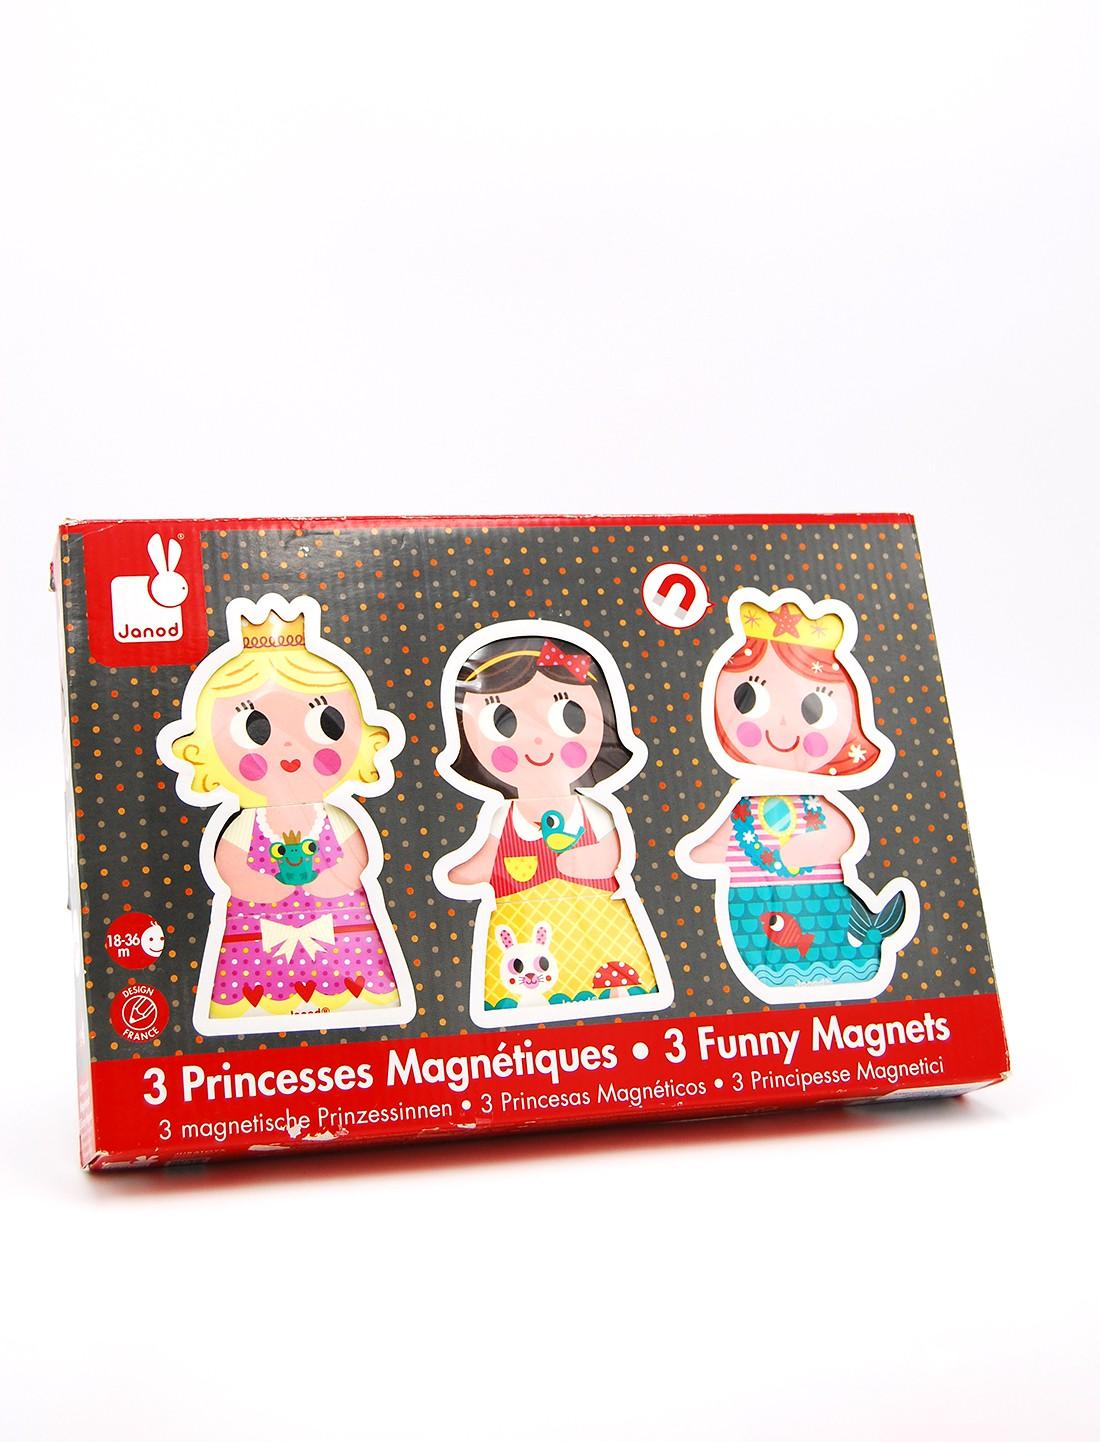 Magnéticos divertidos. Princesas. Janod